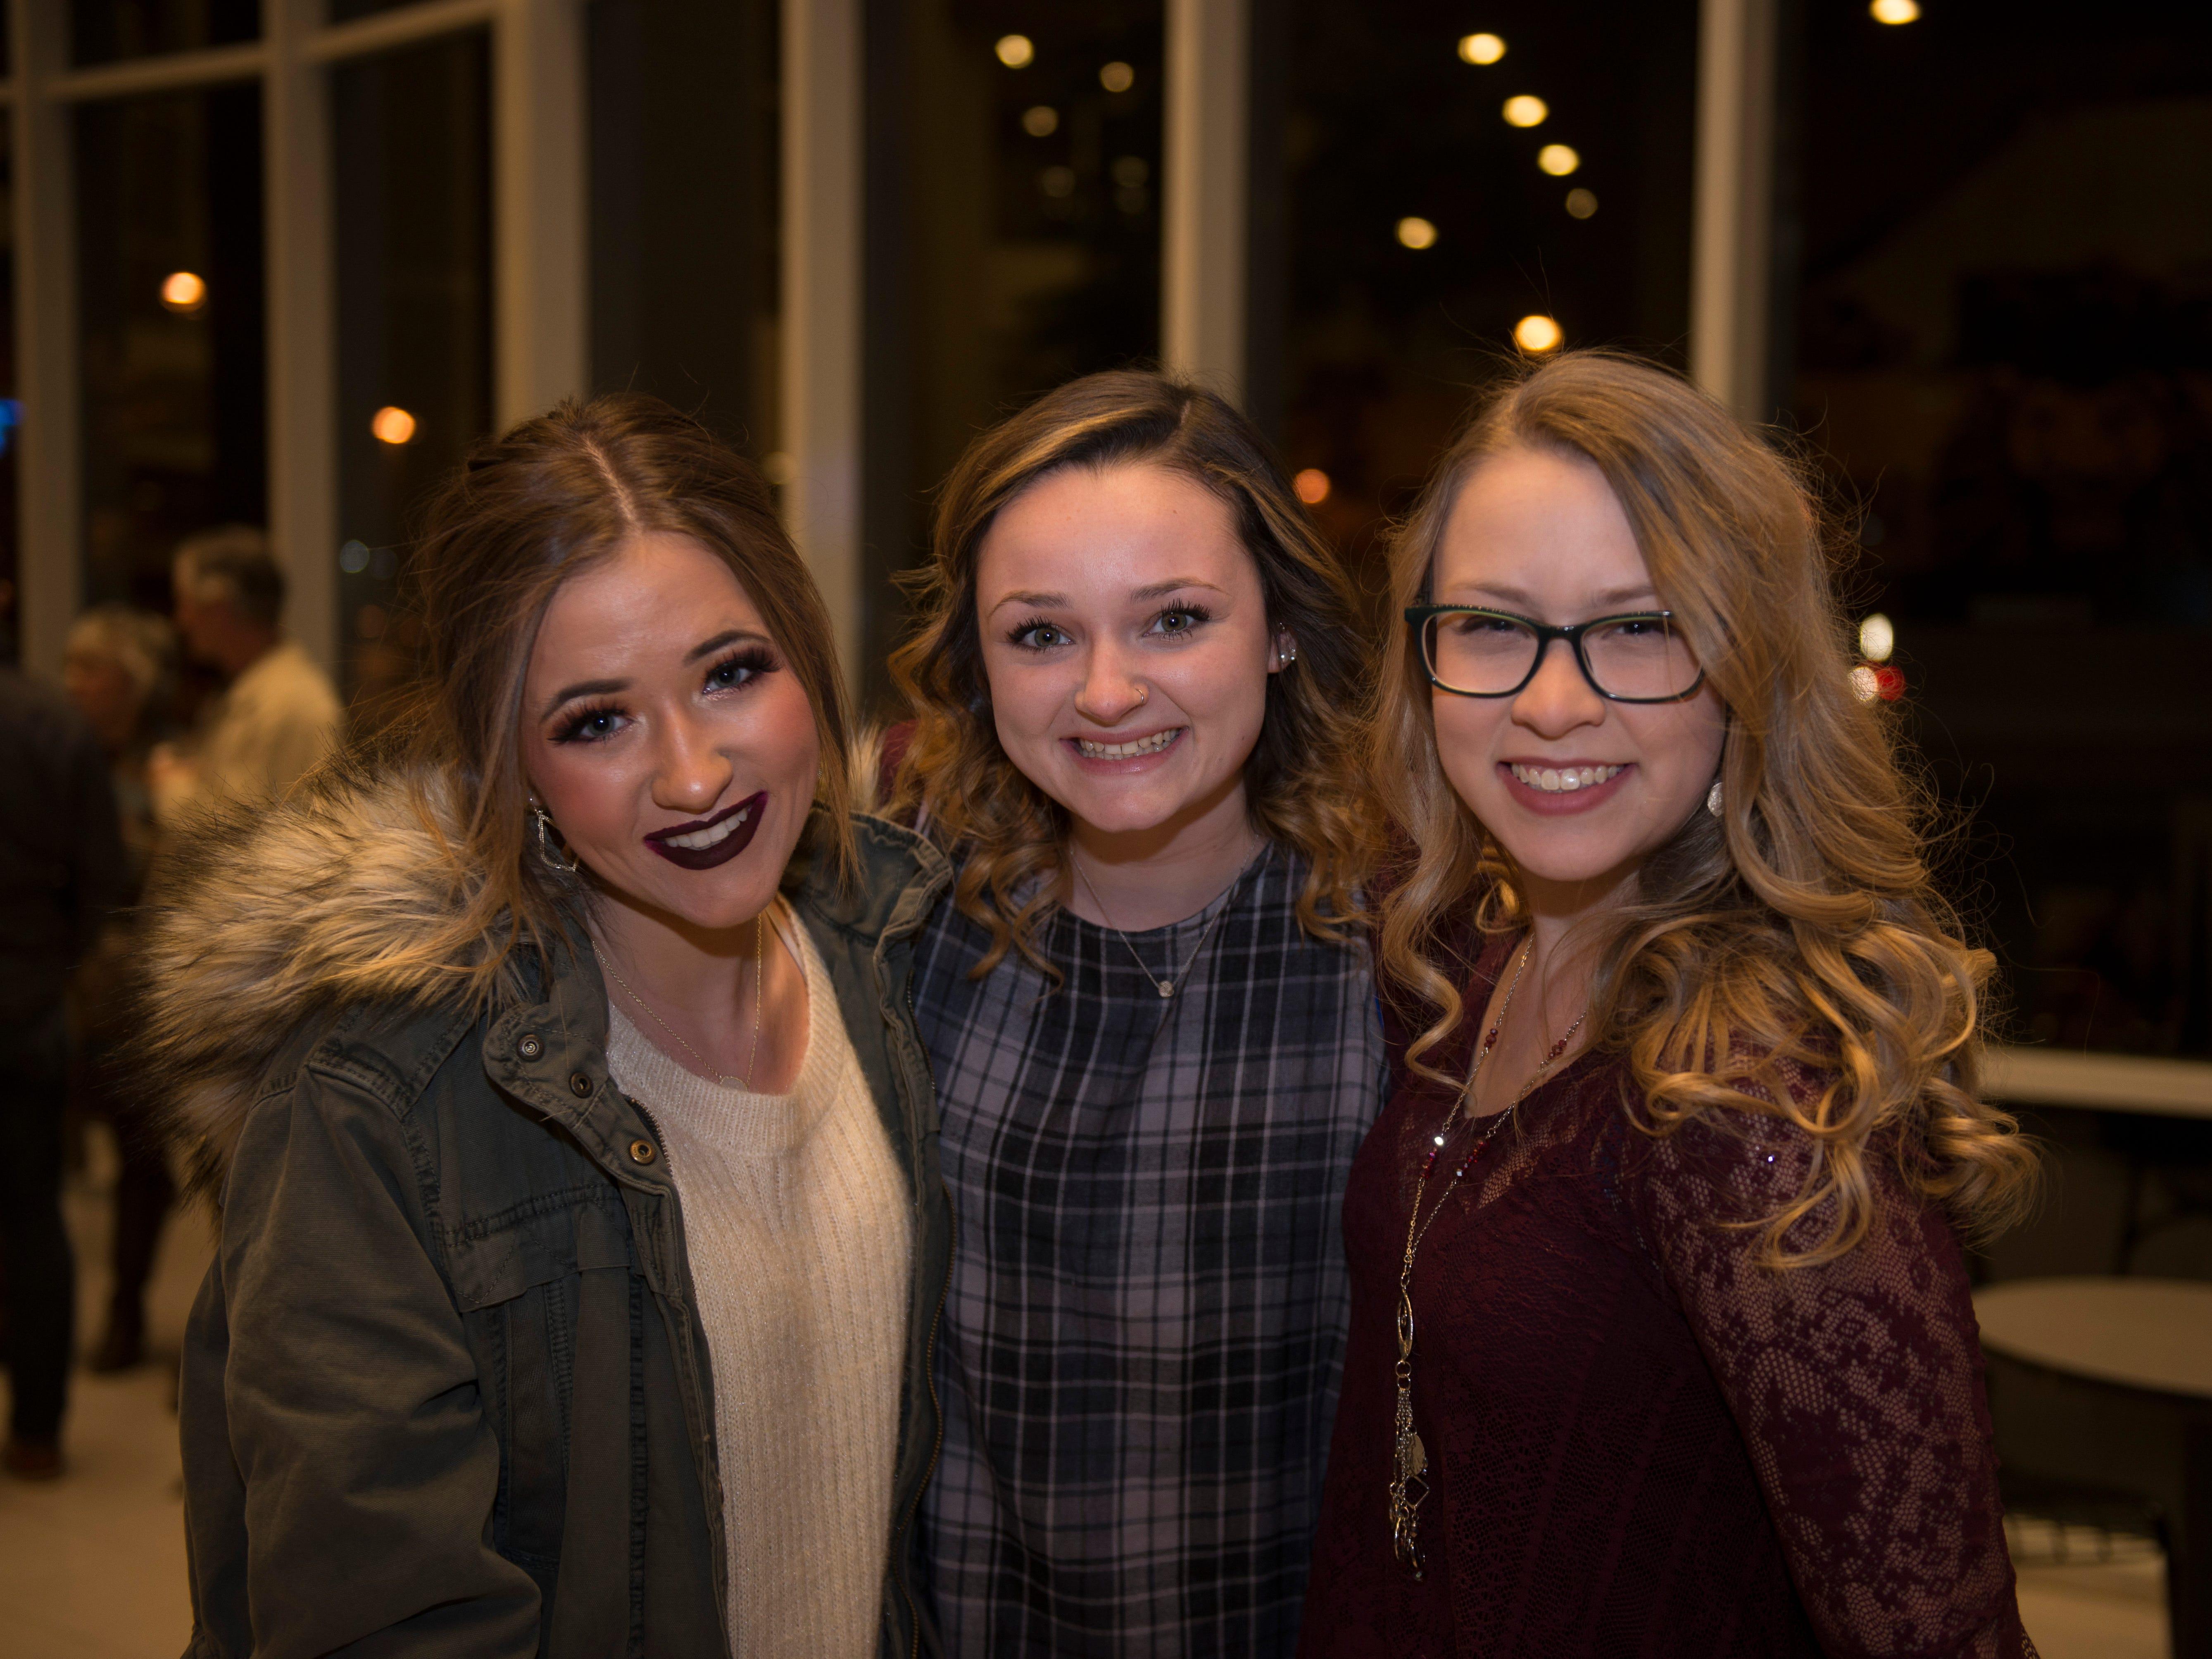 Becca, Madelyn, Riley